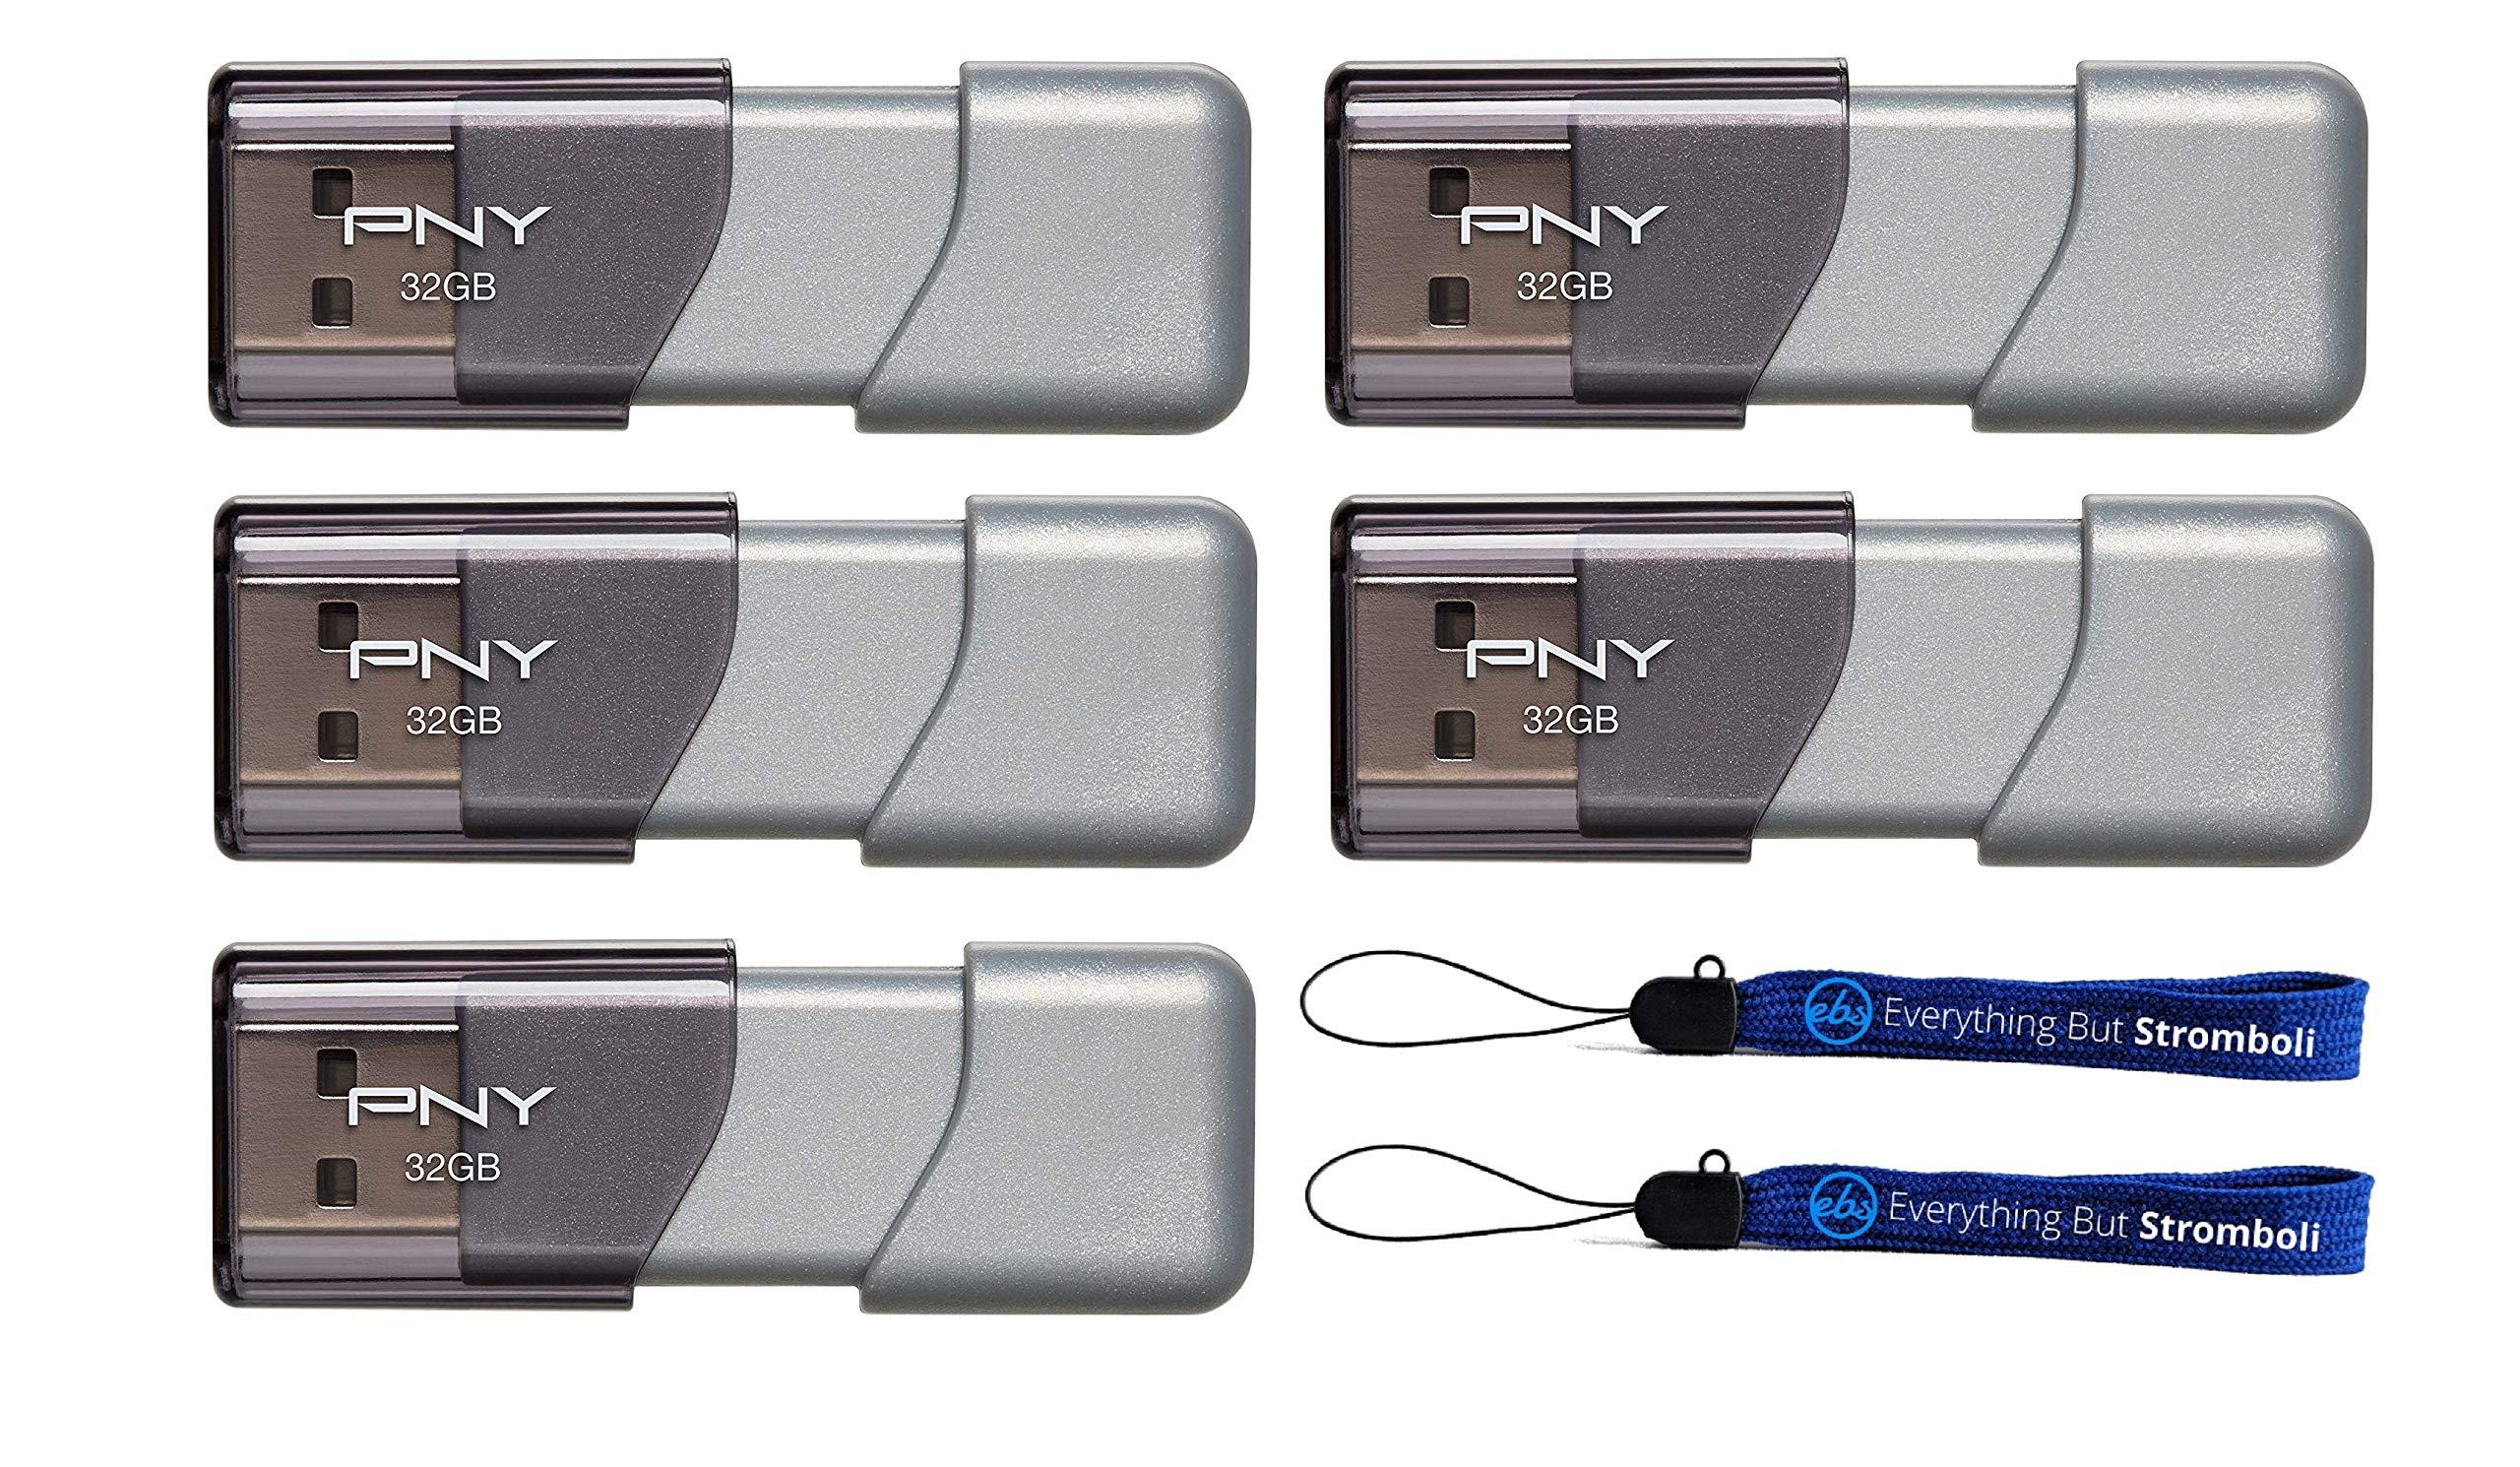 PNY 32GB USB 3.0 Flash Drive Elite Turbo Attache 3 (Five Pack Bundle) Model P-FD32GTBOP-GE Plus (2) Everything But Stromboli (TM) Lanyard